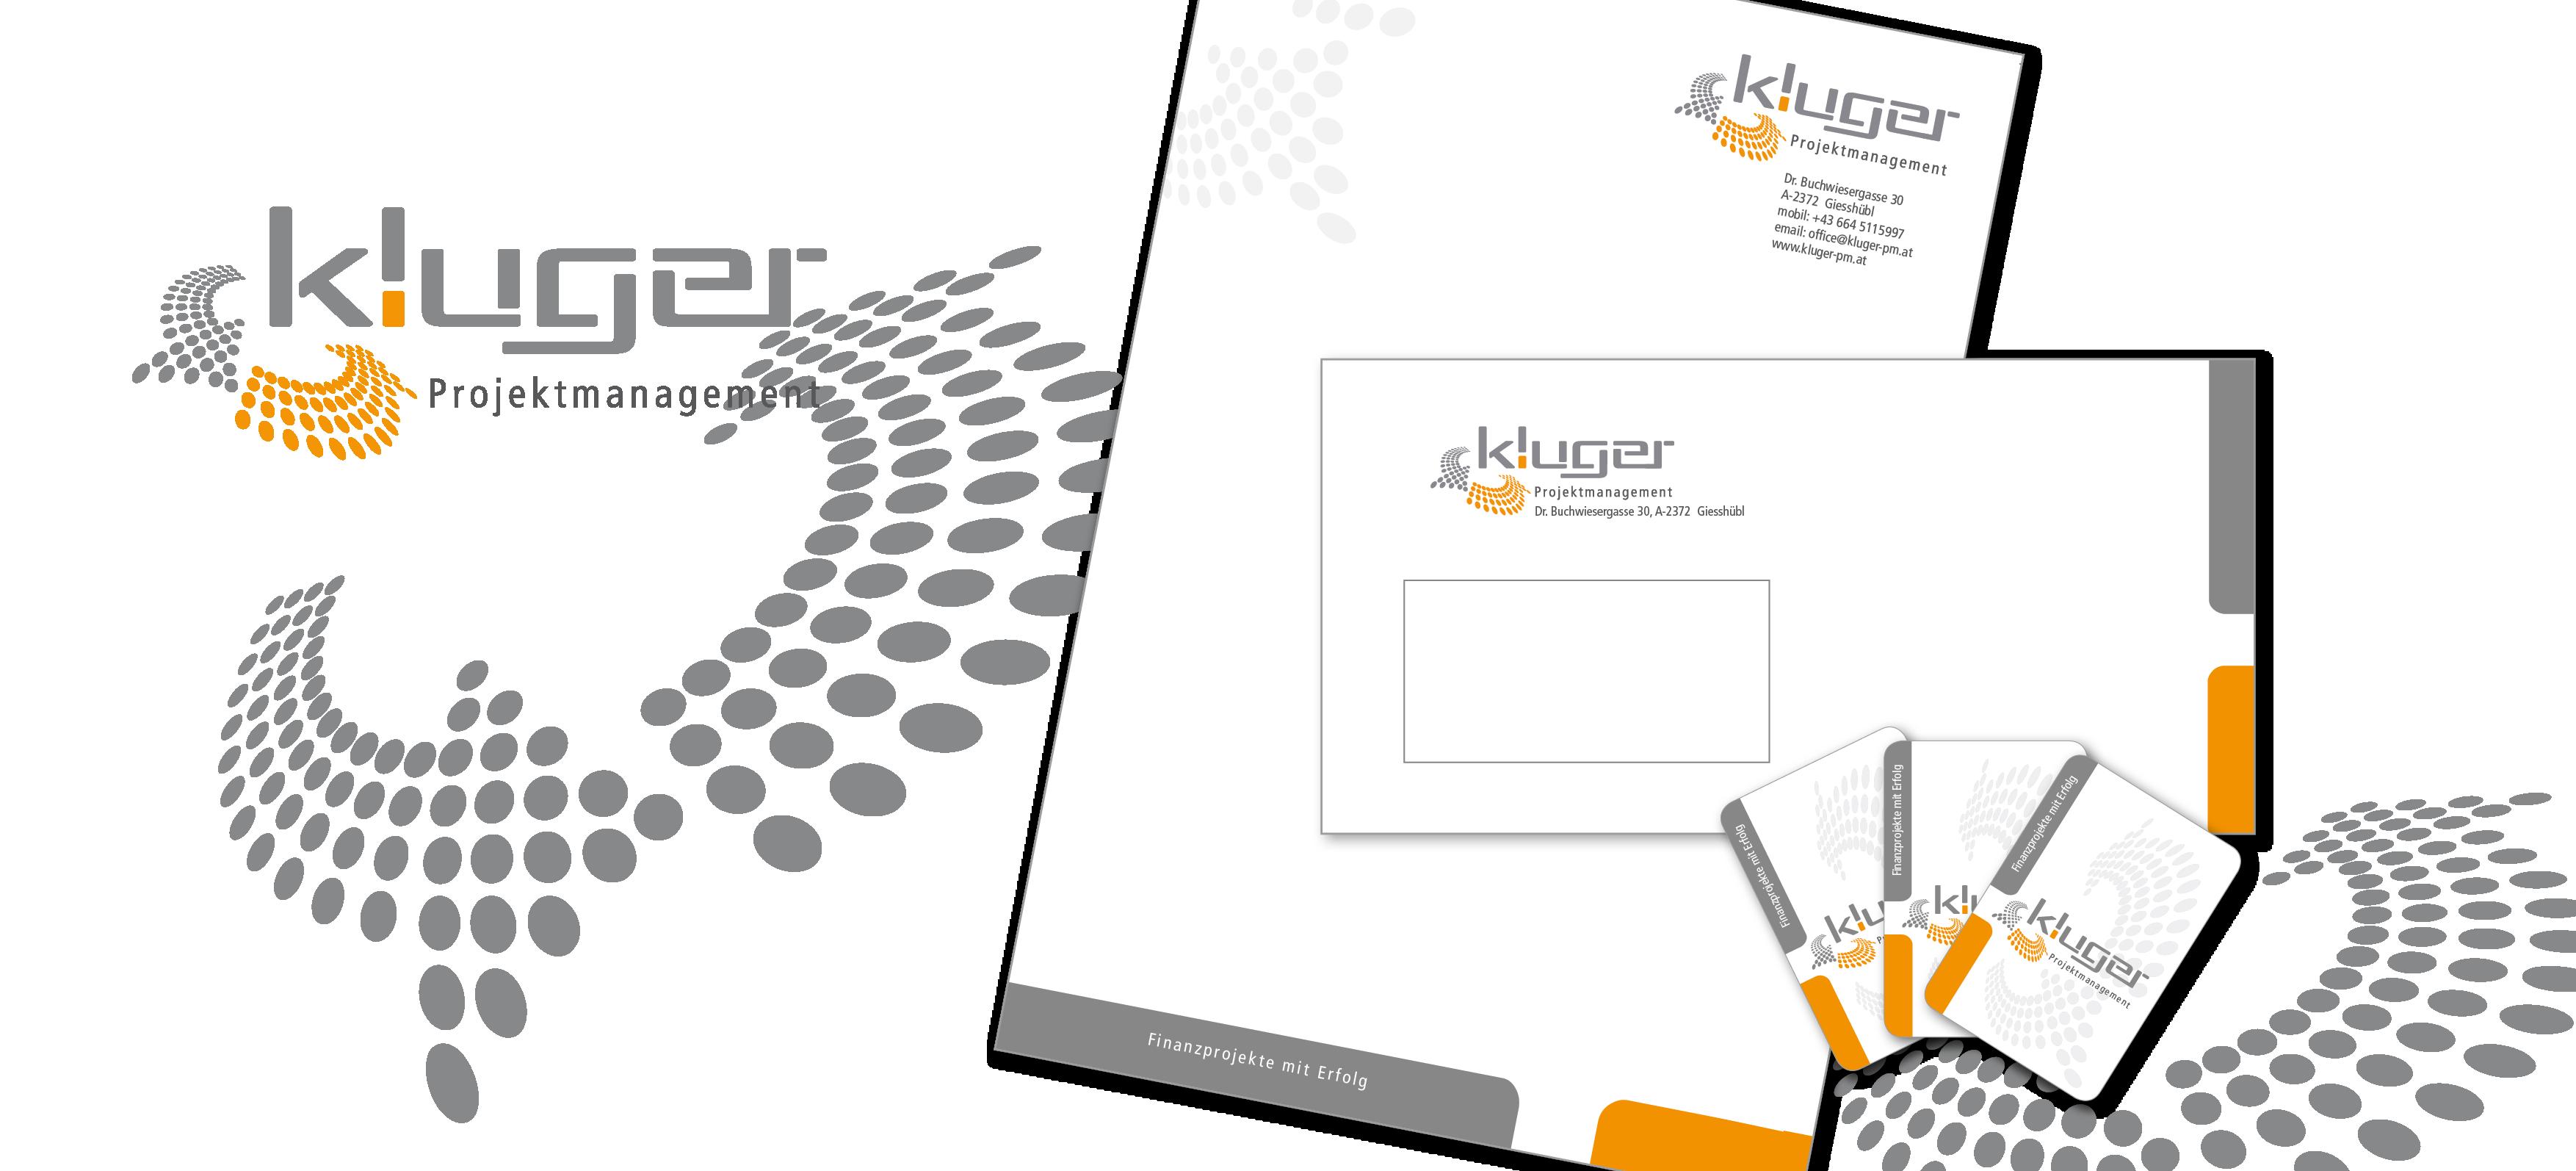 Kluger Projektmanagement Wien